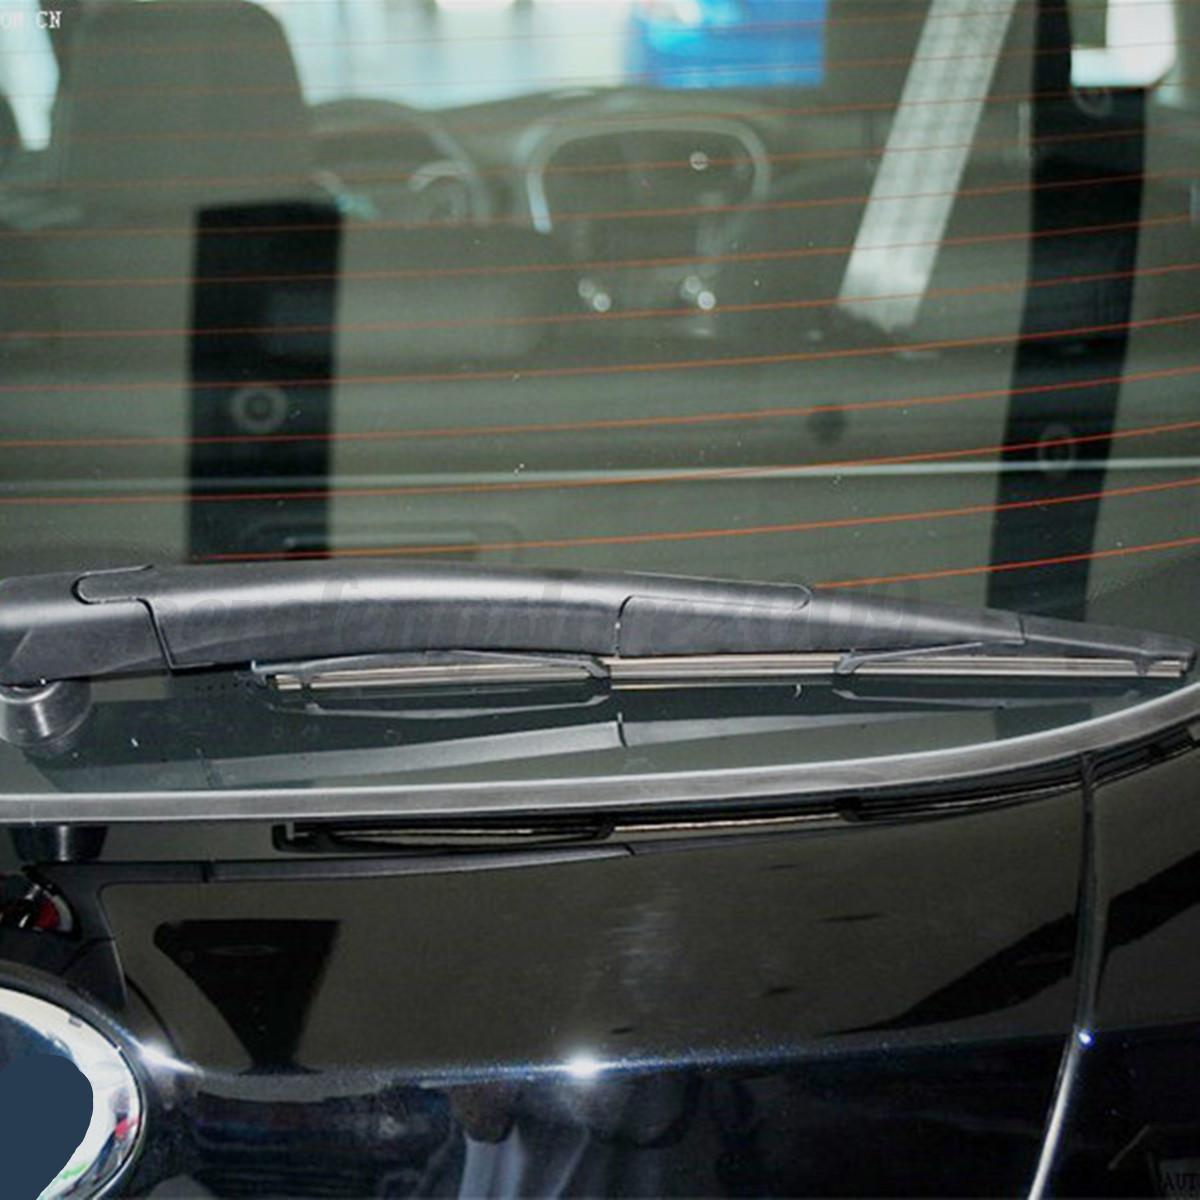 Cars Wallpaper Hd For Desktop Laptop And Gadget